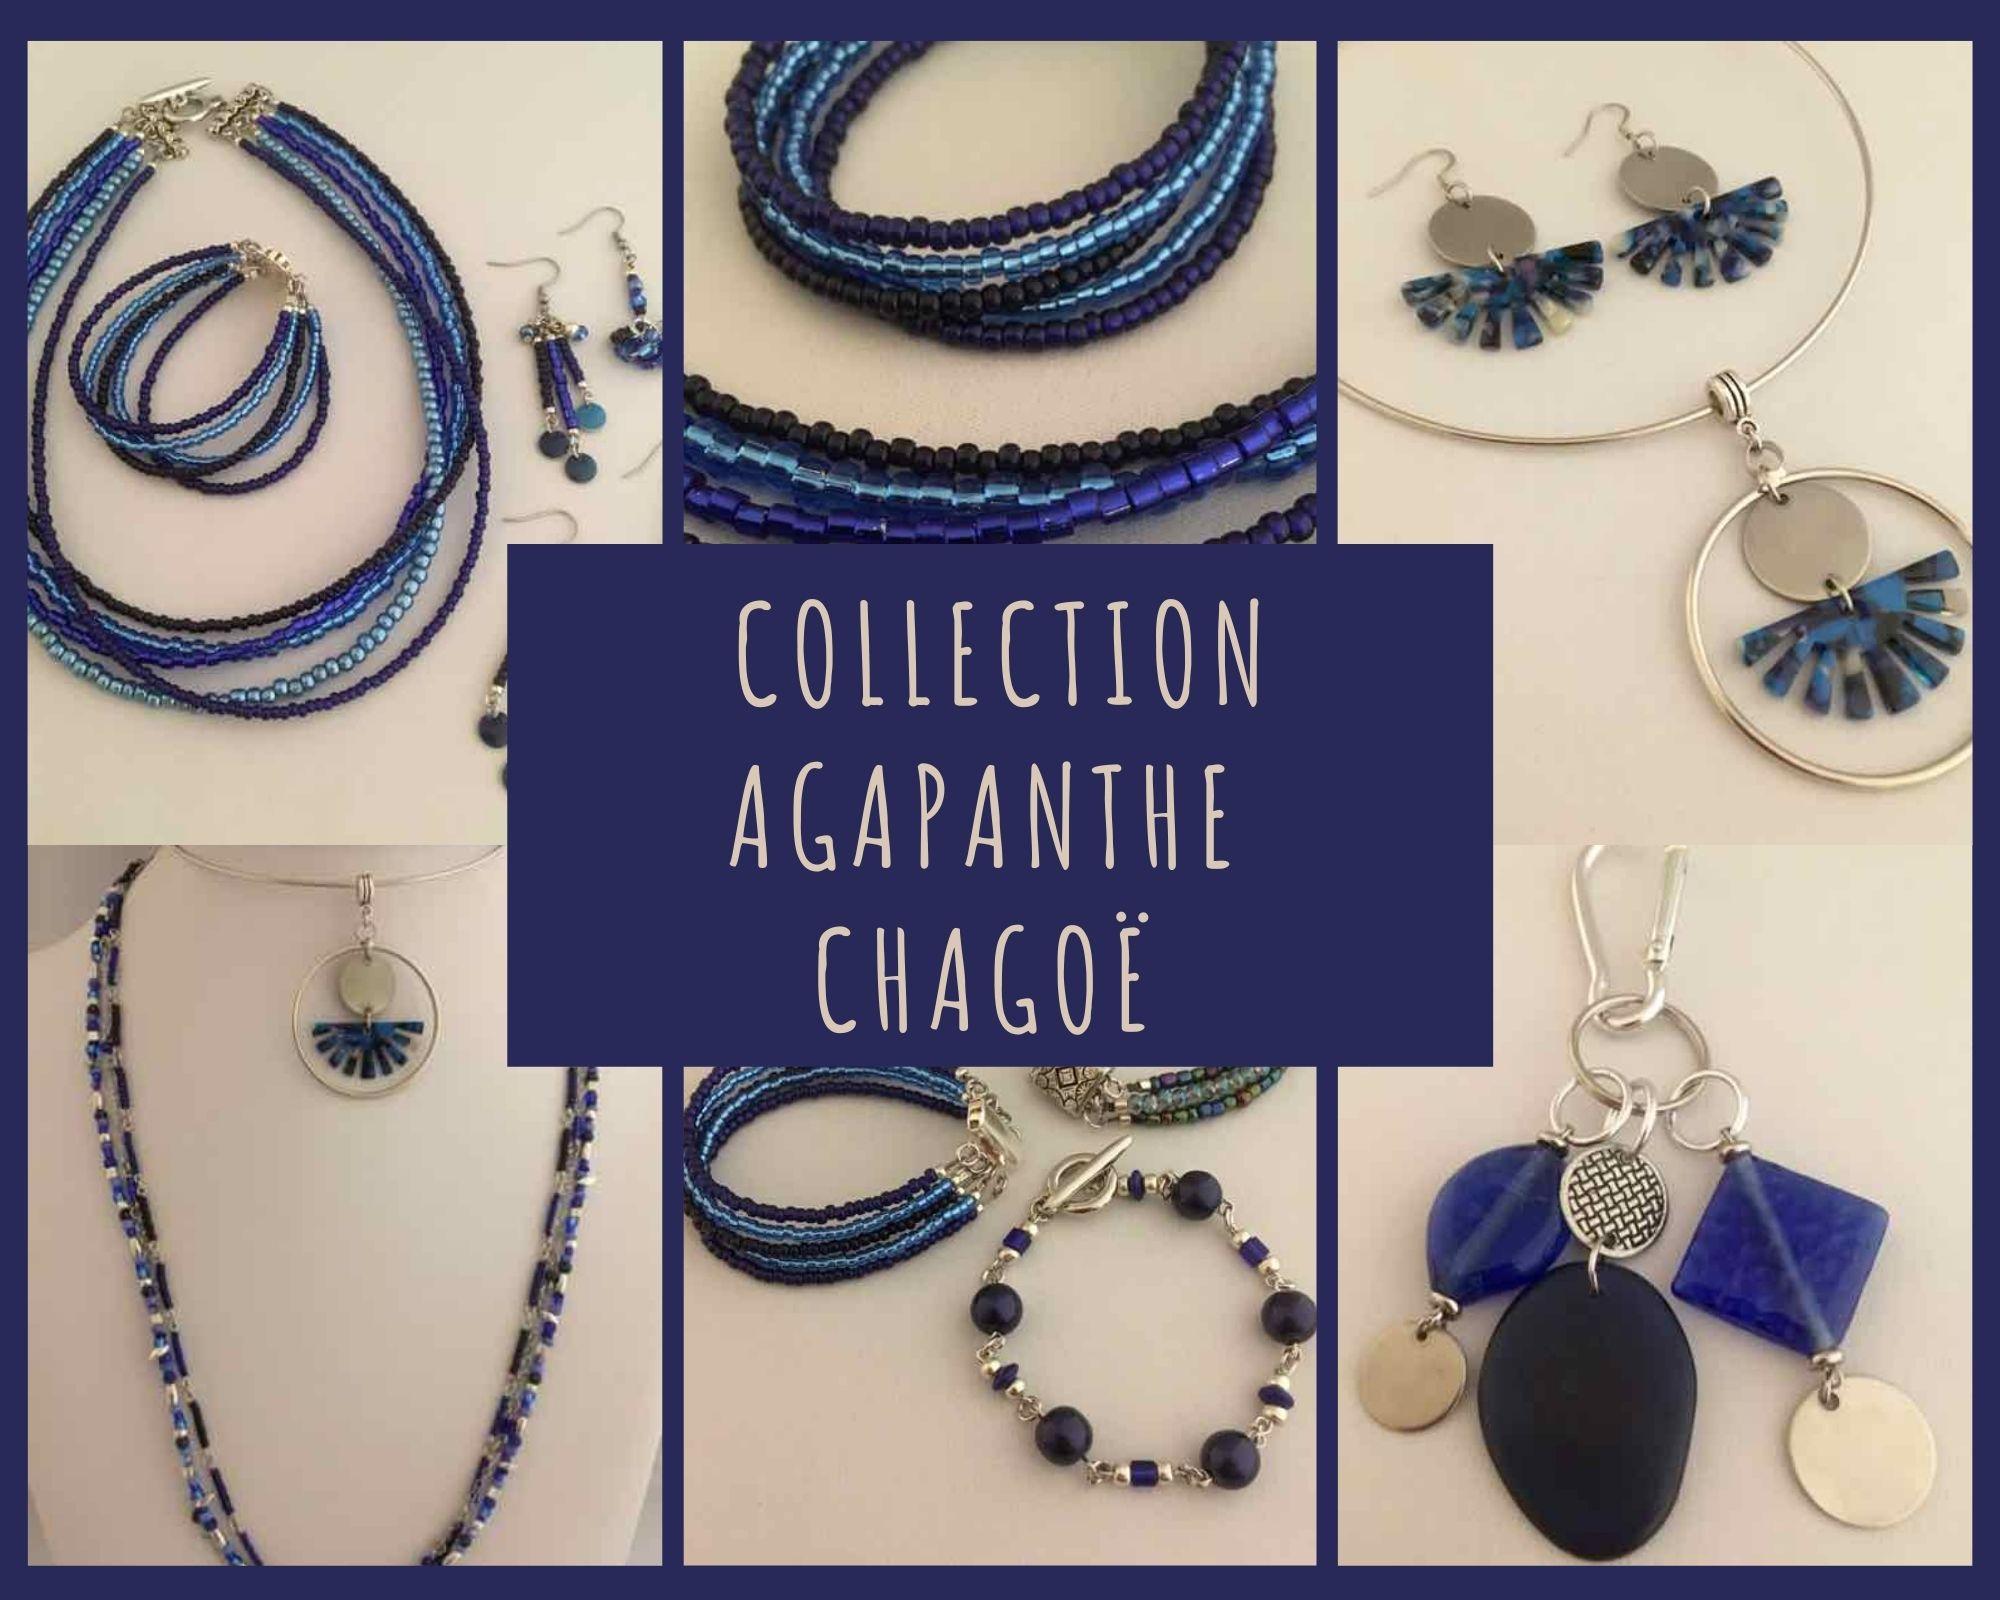 Collection AGAPANTHE Chagoë 2021